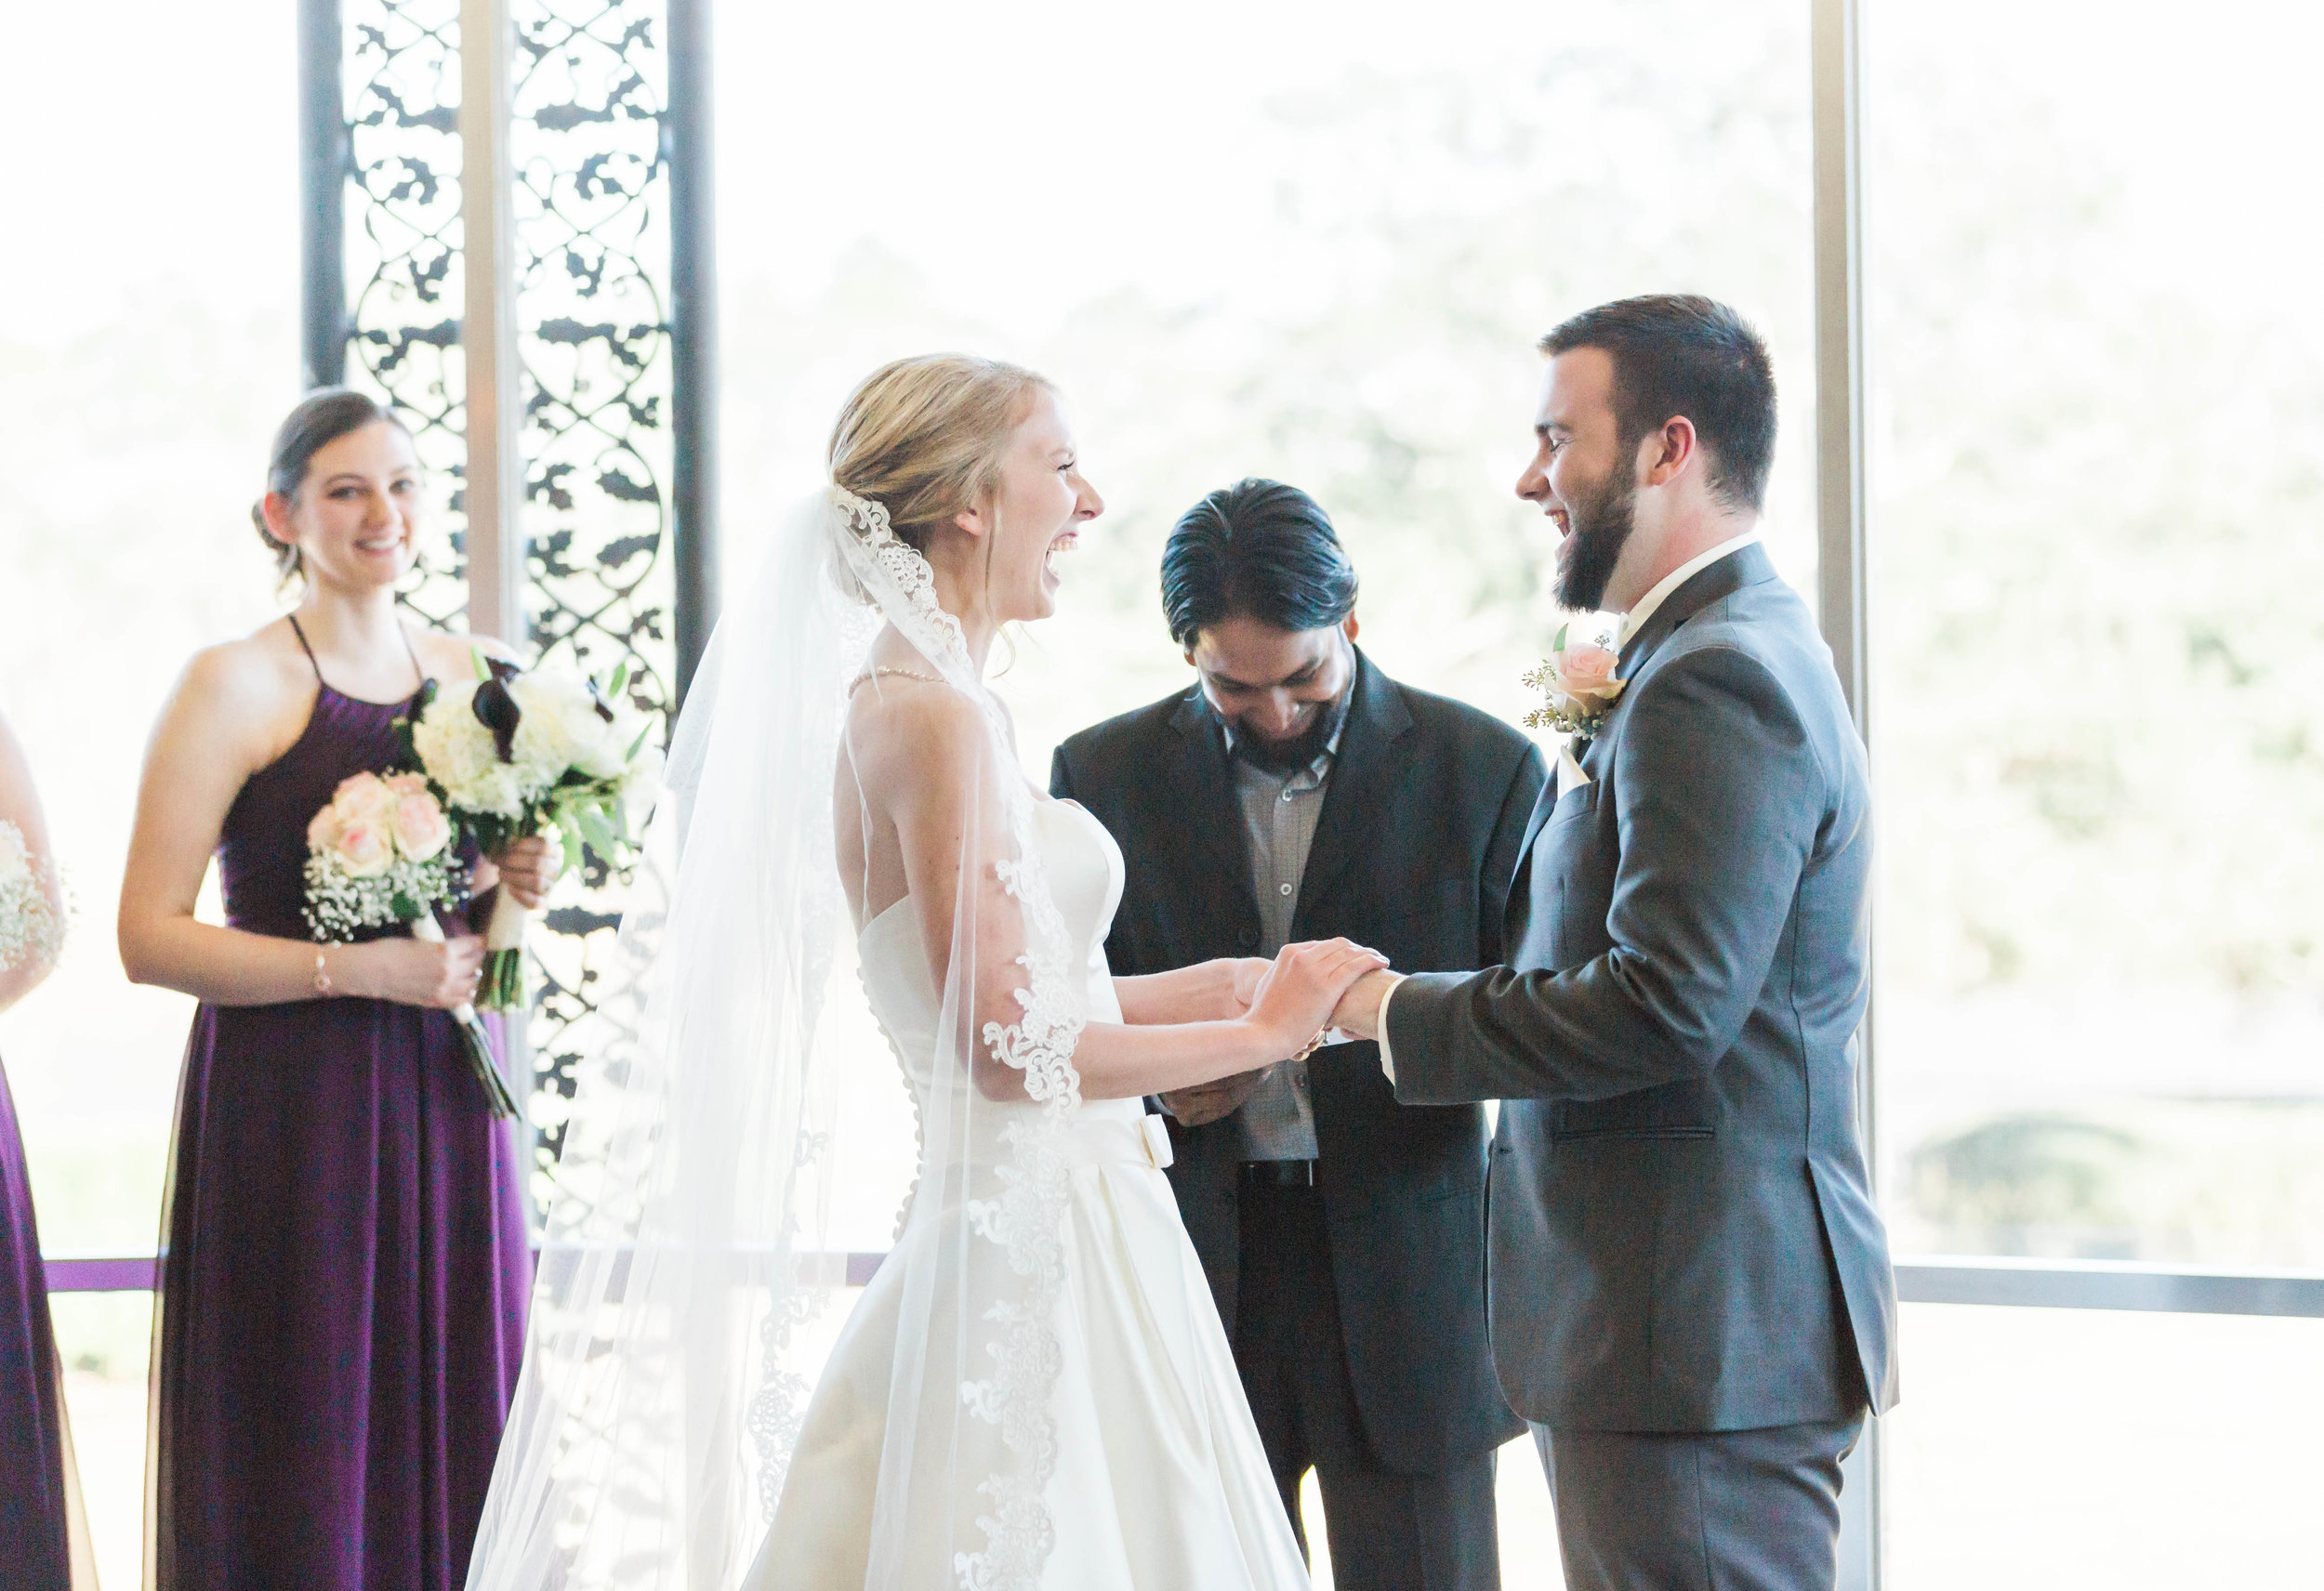 Beaumont Texas Country Club wedding-5848.jpg